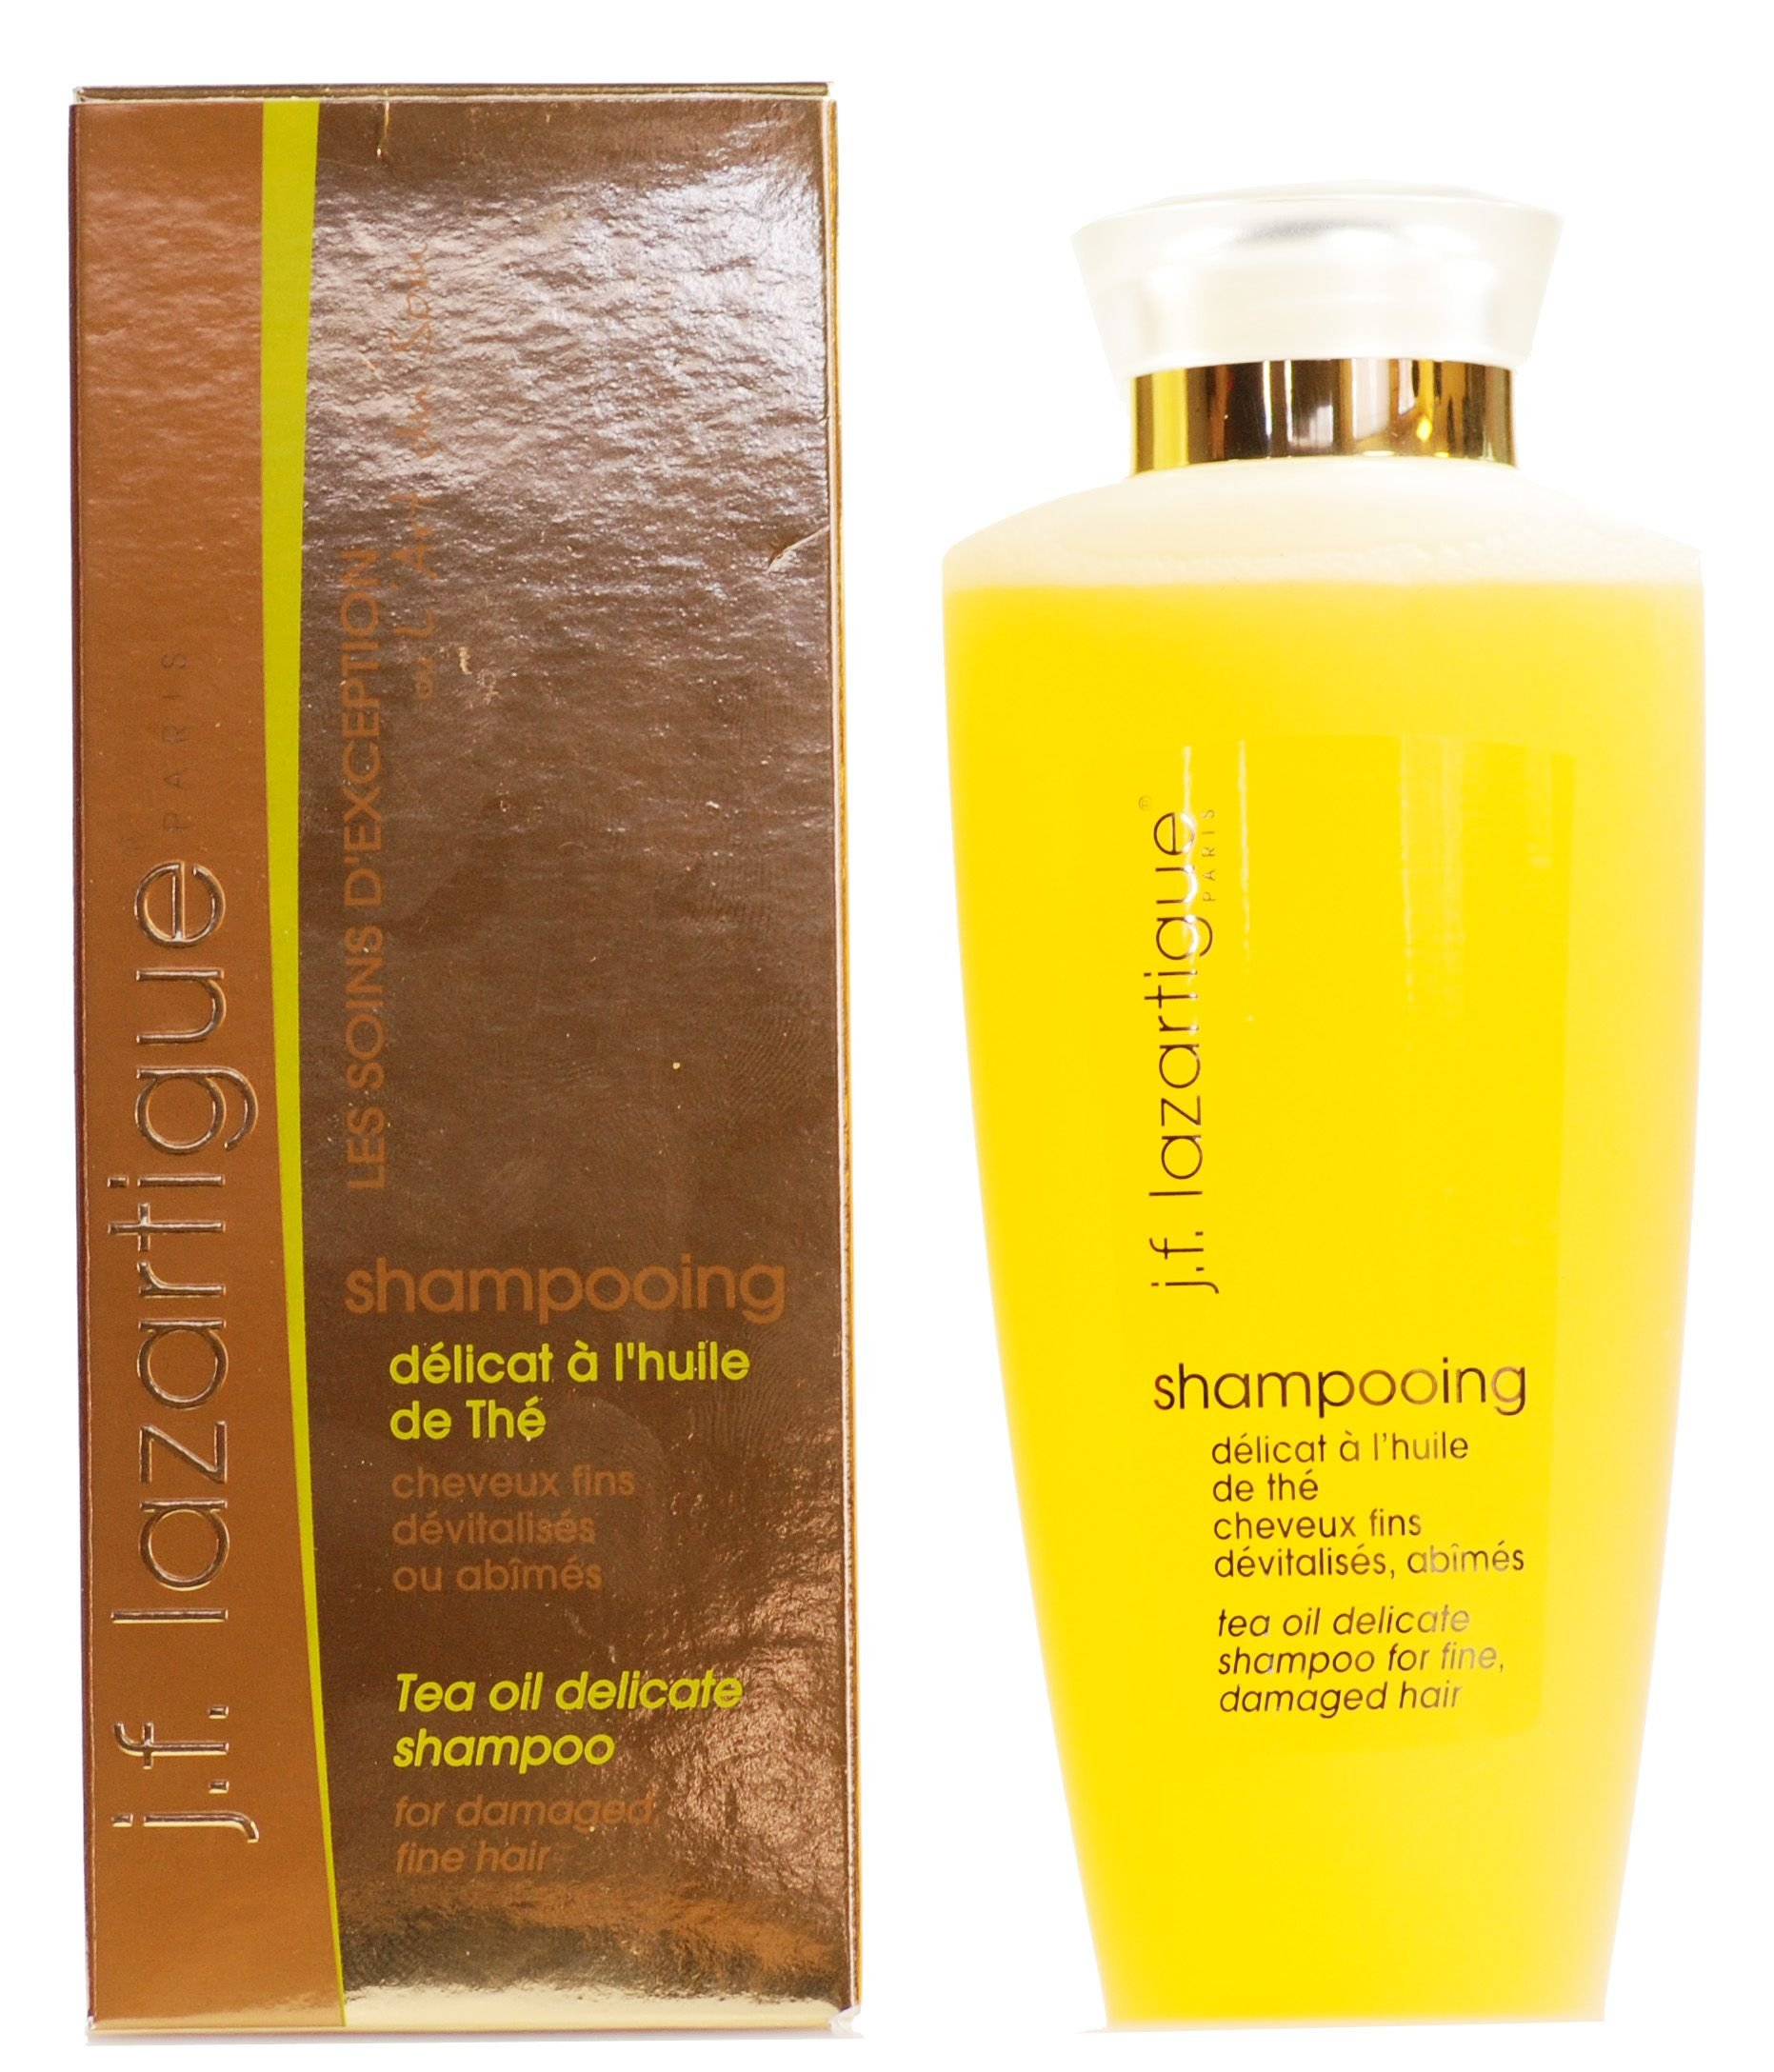 J. F. Lazartigue Tea Oil Delicate Shampoo